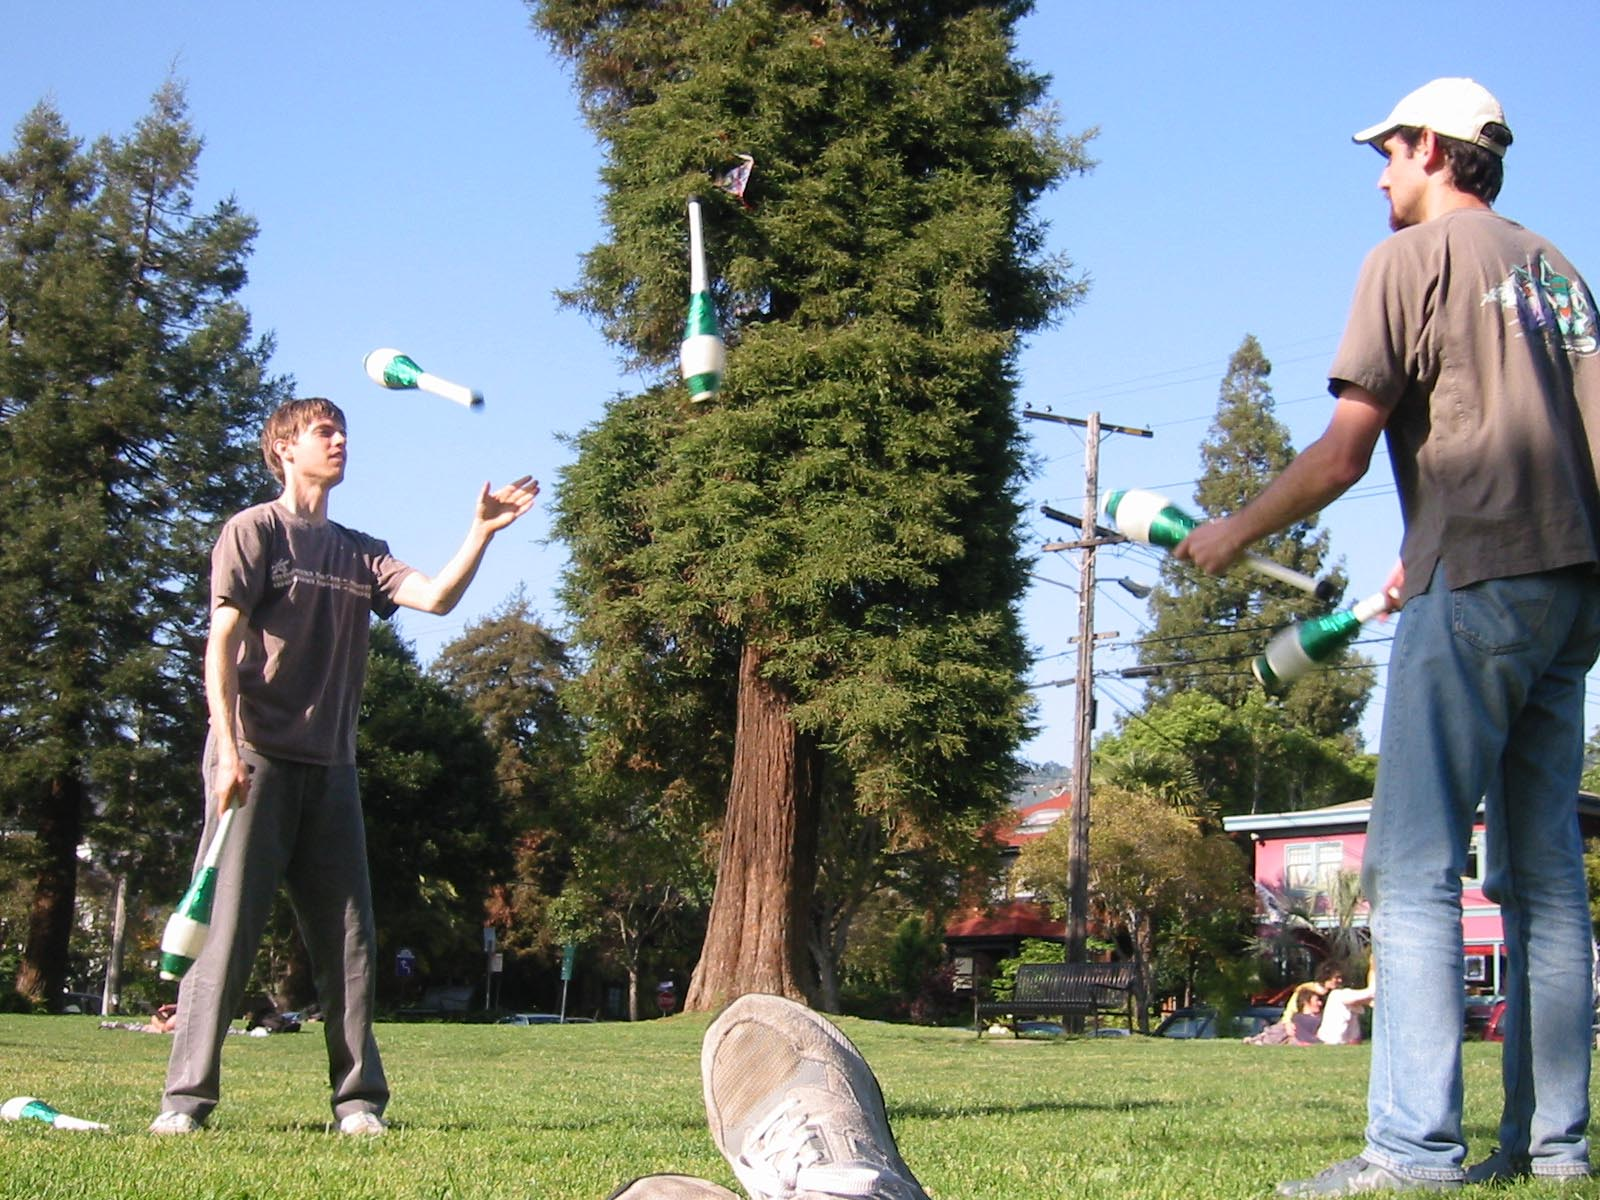 jugglers12